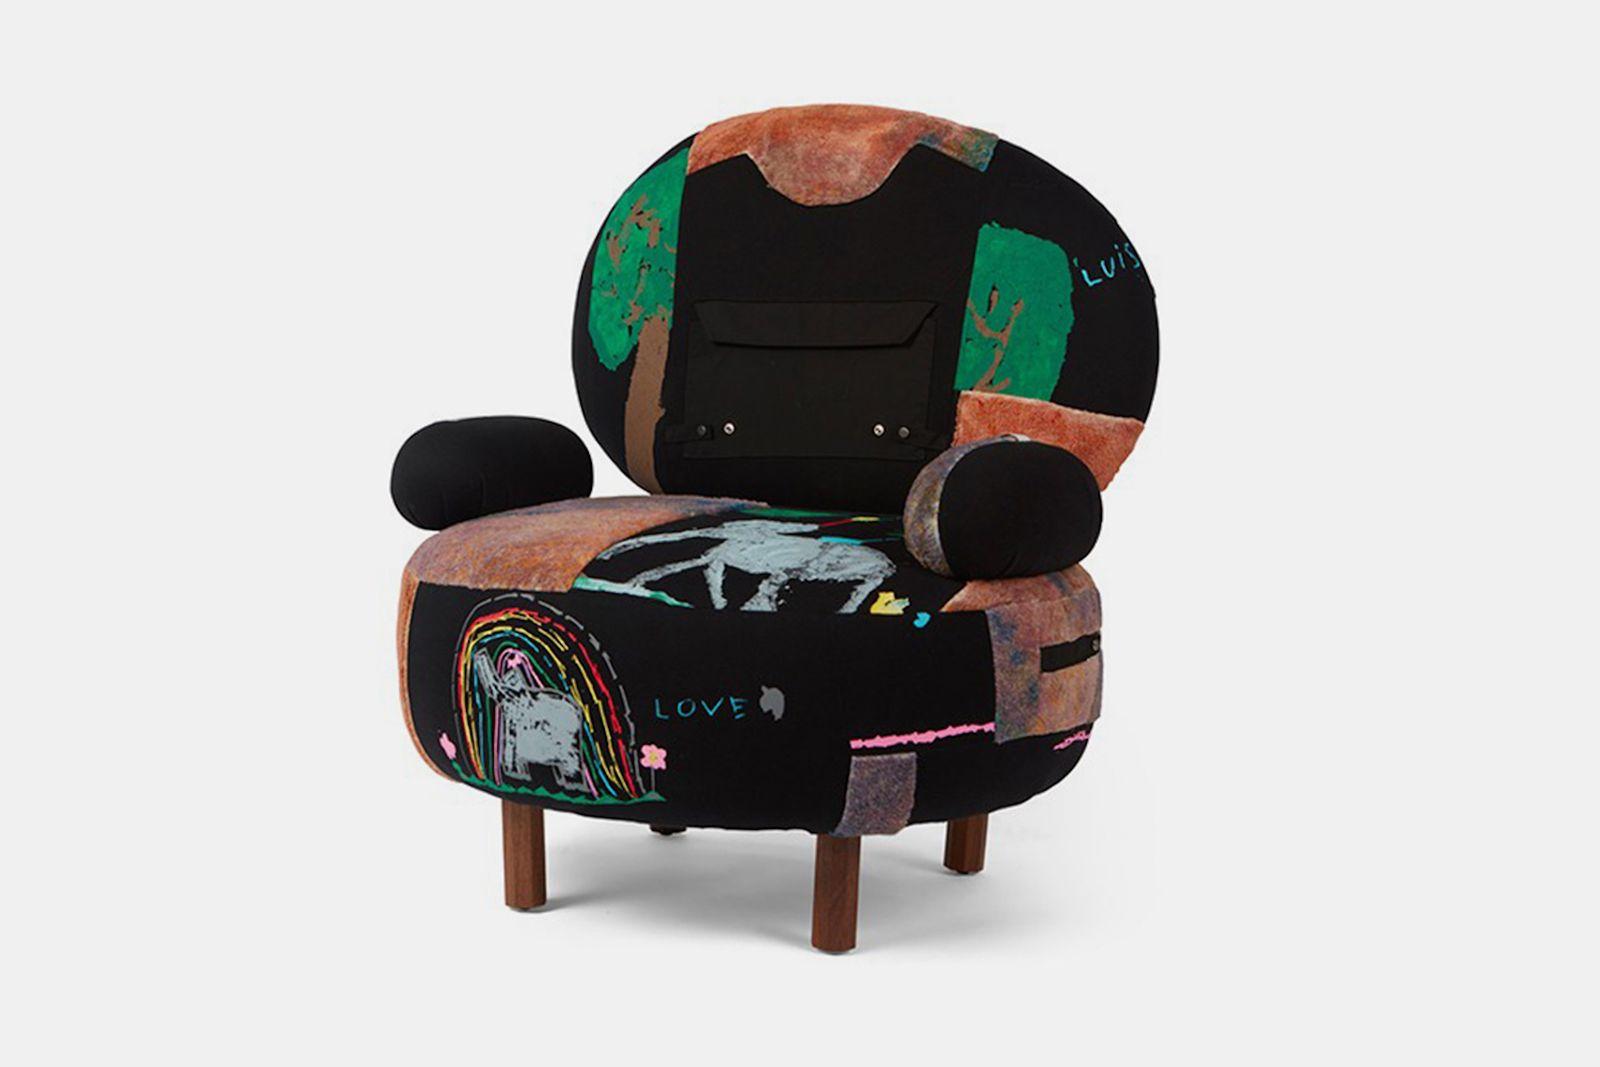 drx romanelli ln cc rxcycle furniture dr romanelli ln-cc